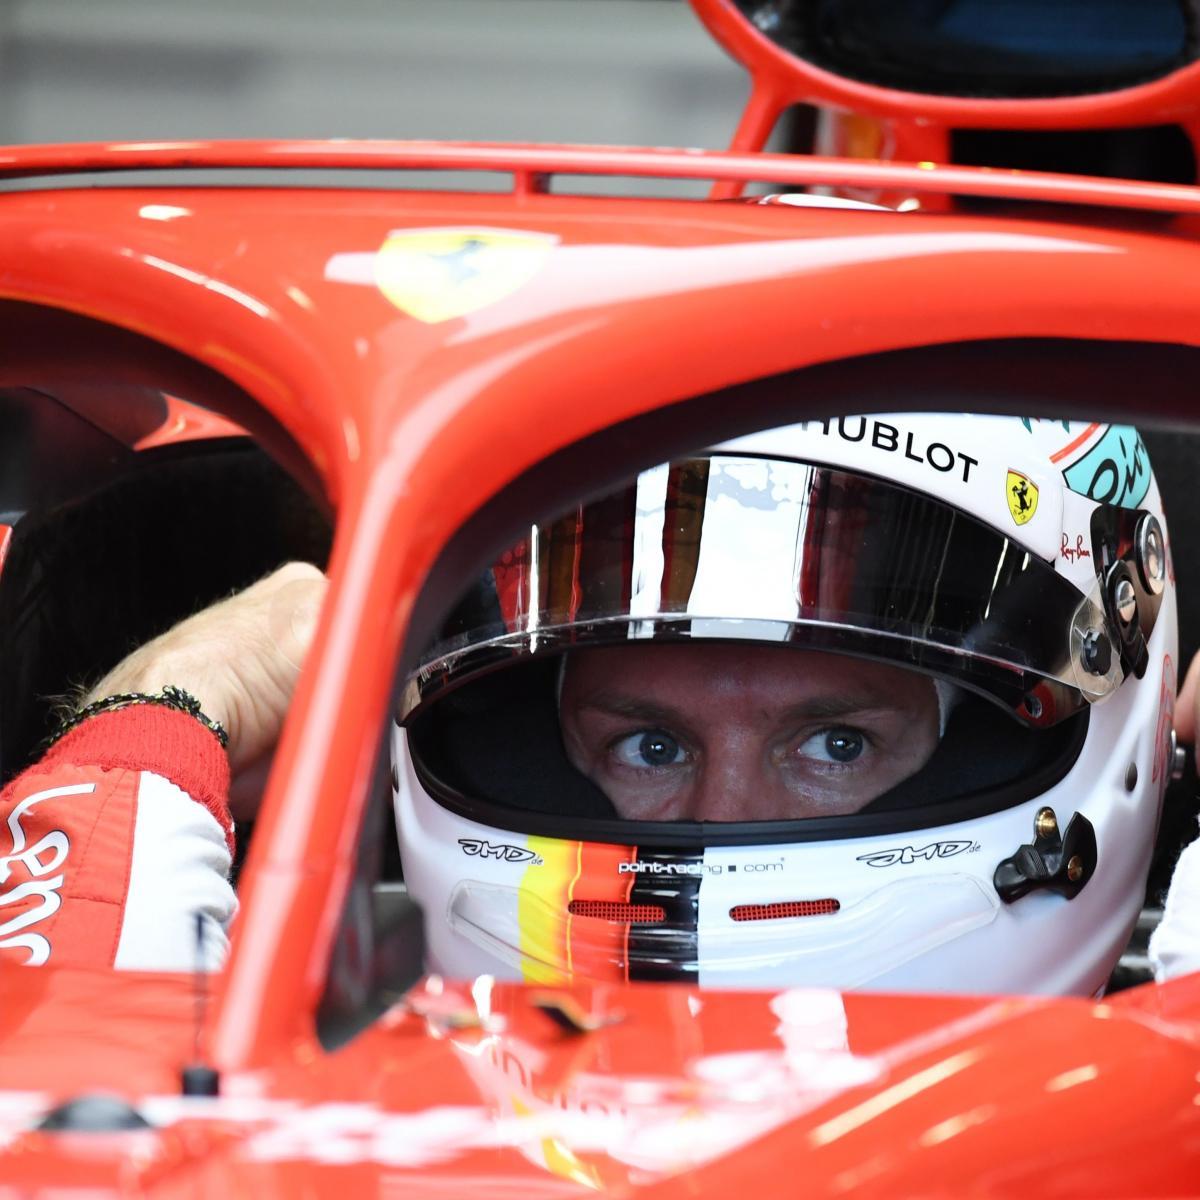 Azerbaijan News And Scores: Azerbaijan F1 Grand Prix 2018 Qualifying: Saturday's